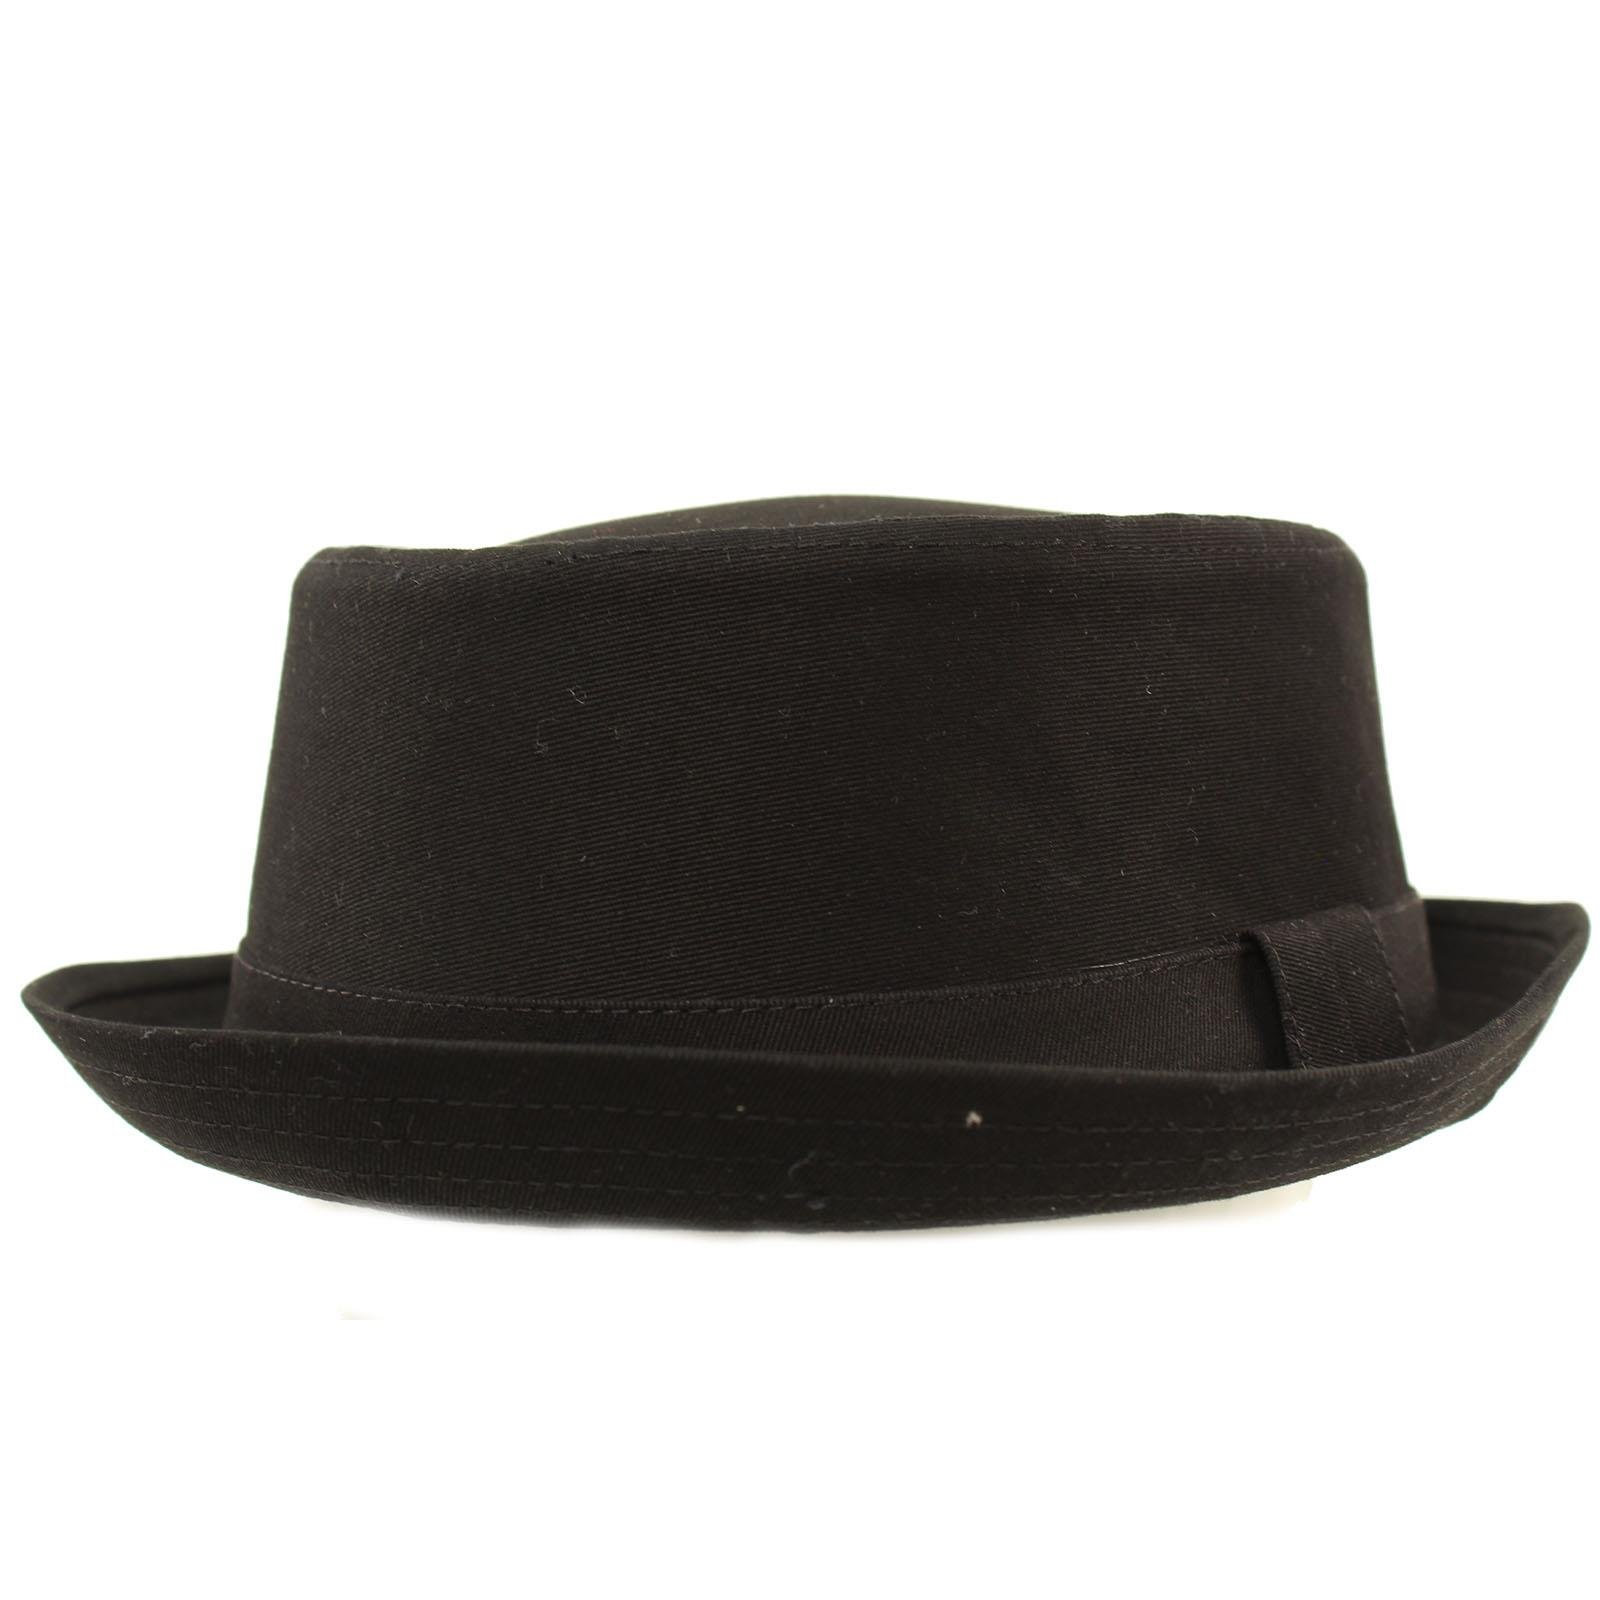 SK Hat shop Men's Everyday Cotton All Season Porkpie Boater Derby Fedora Sun Hat L/XL